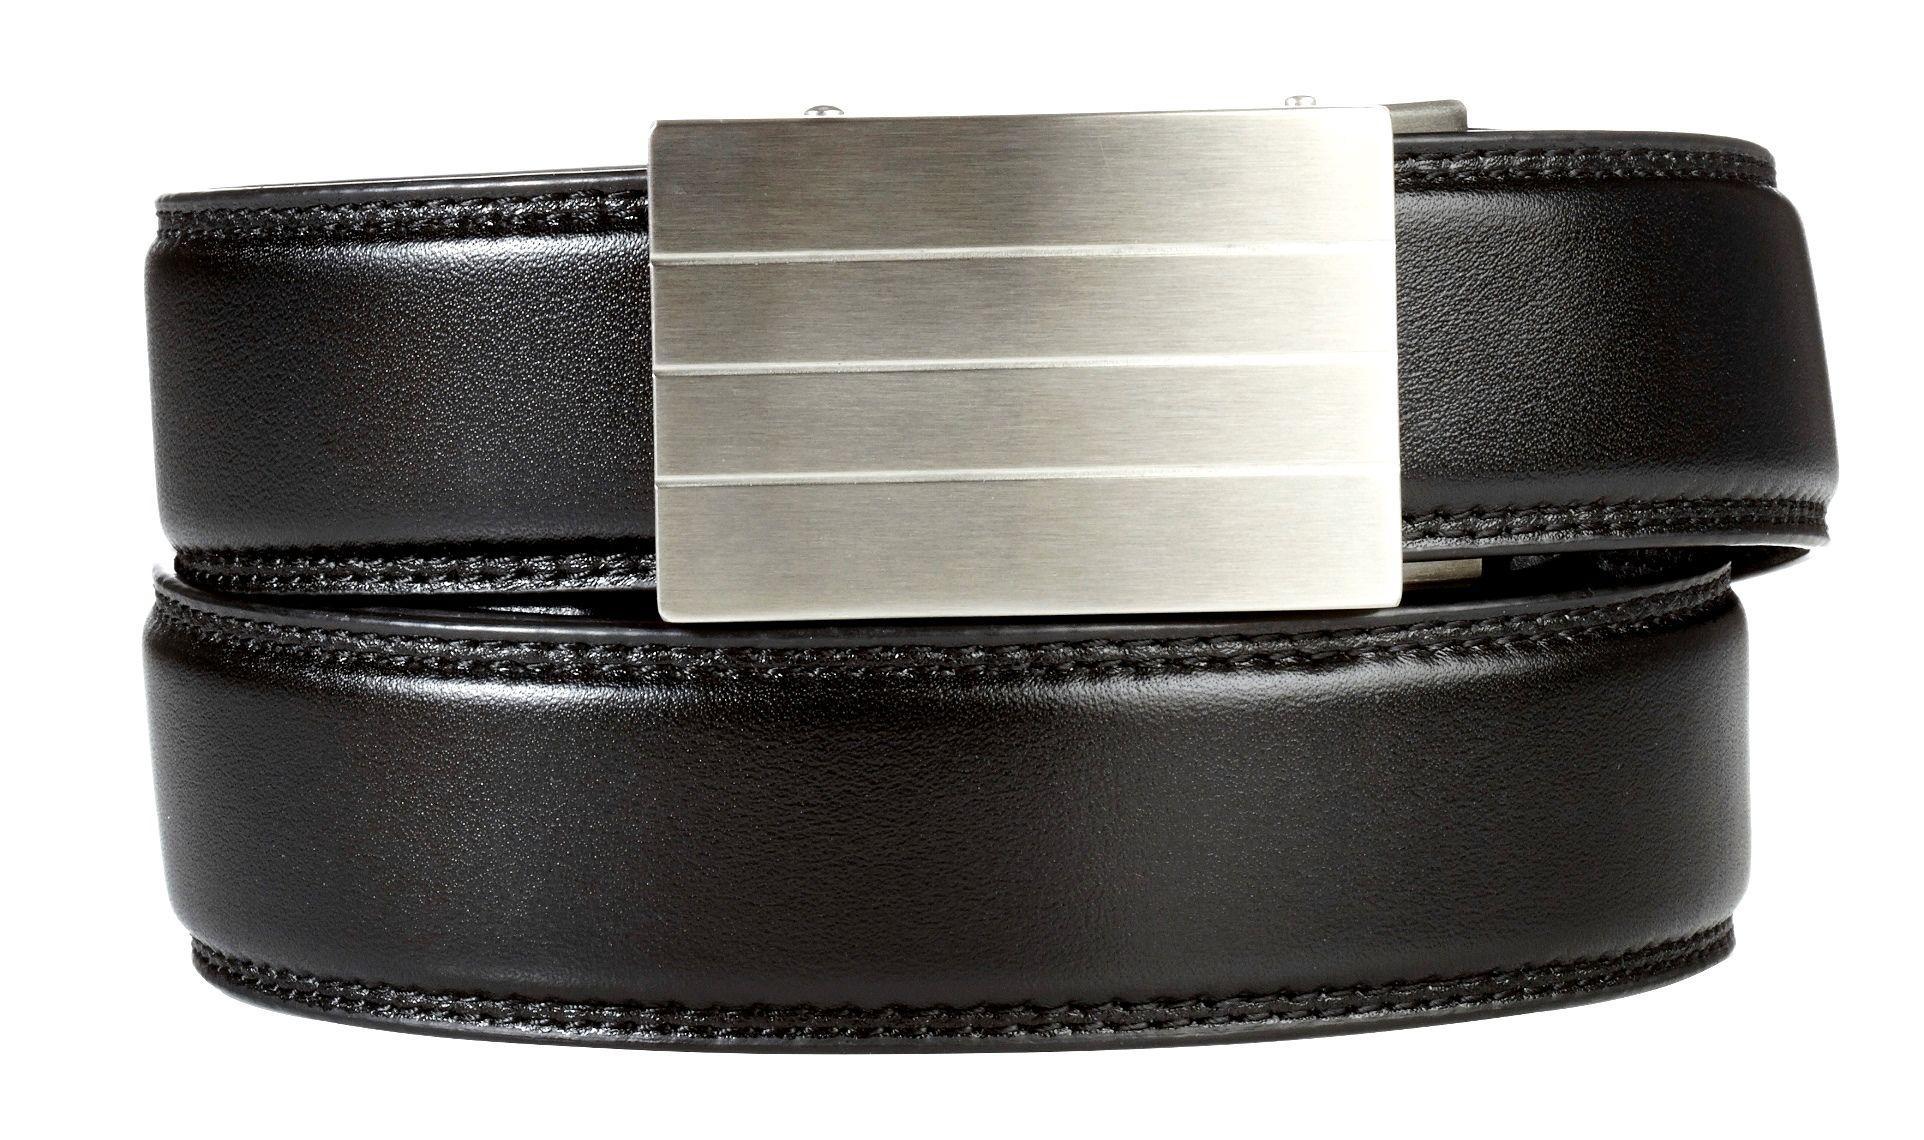 Father S Day Blog Giveaway Belt Belt Buckles Mens Essentials Kore essentials x1 is the best carry belt i've experienced. pinterest